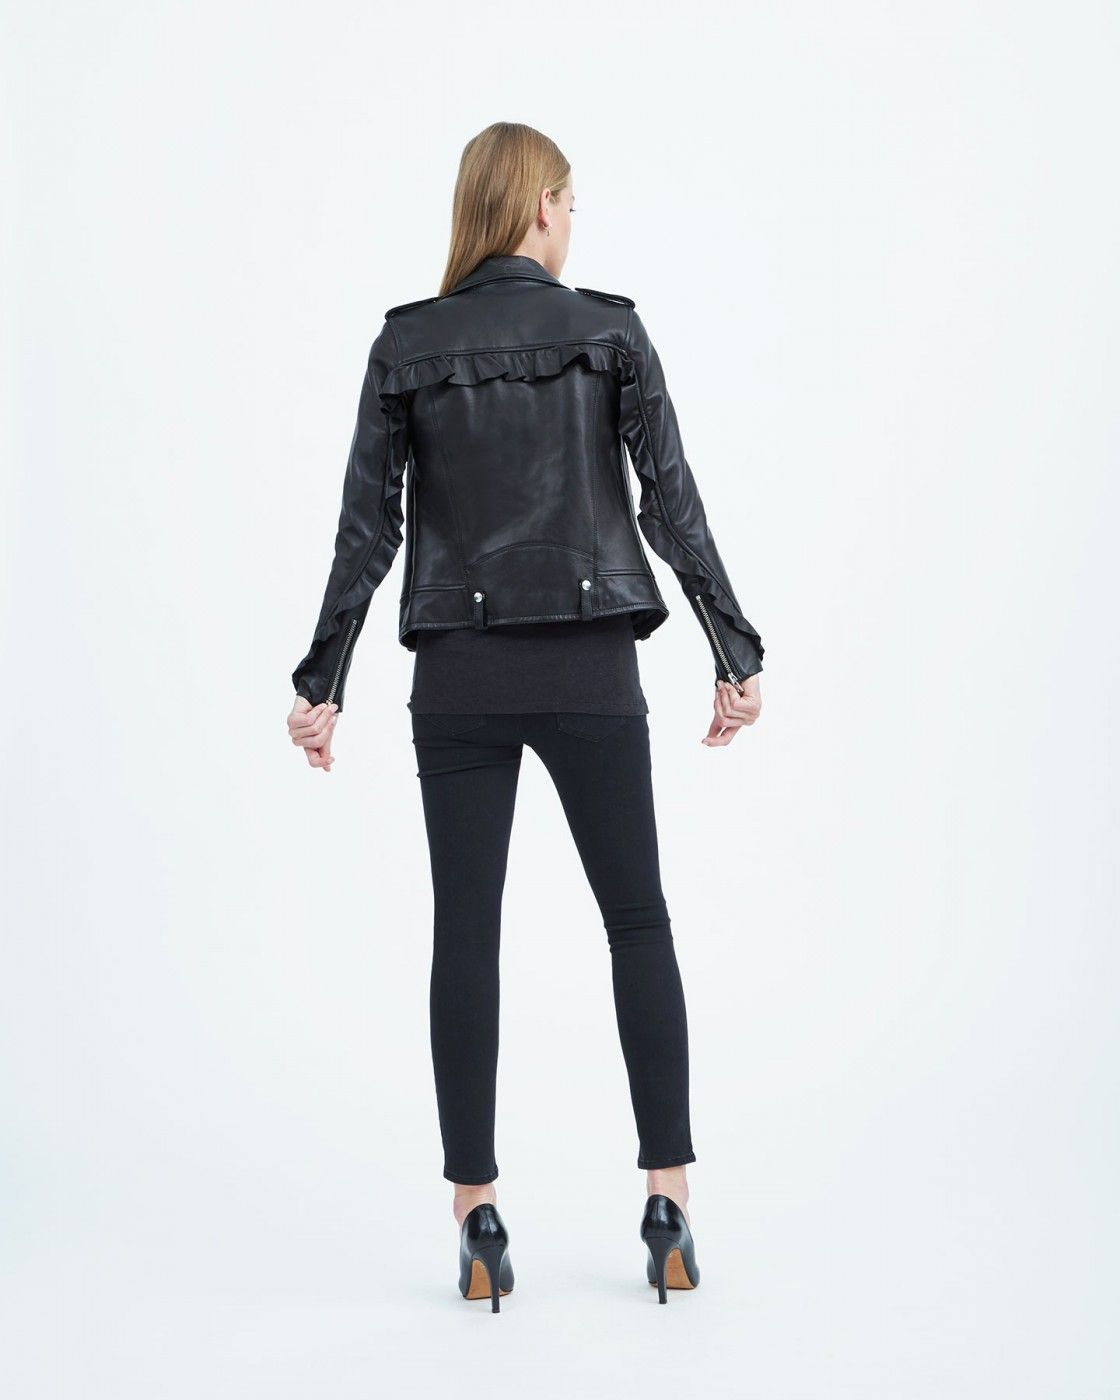 Iro Fall Winter 17 Collection Dumont Leather Jacket Iro Tendencias Invierno [ 1400 x 1120 Pixel ]